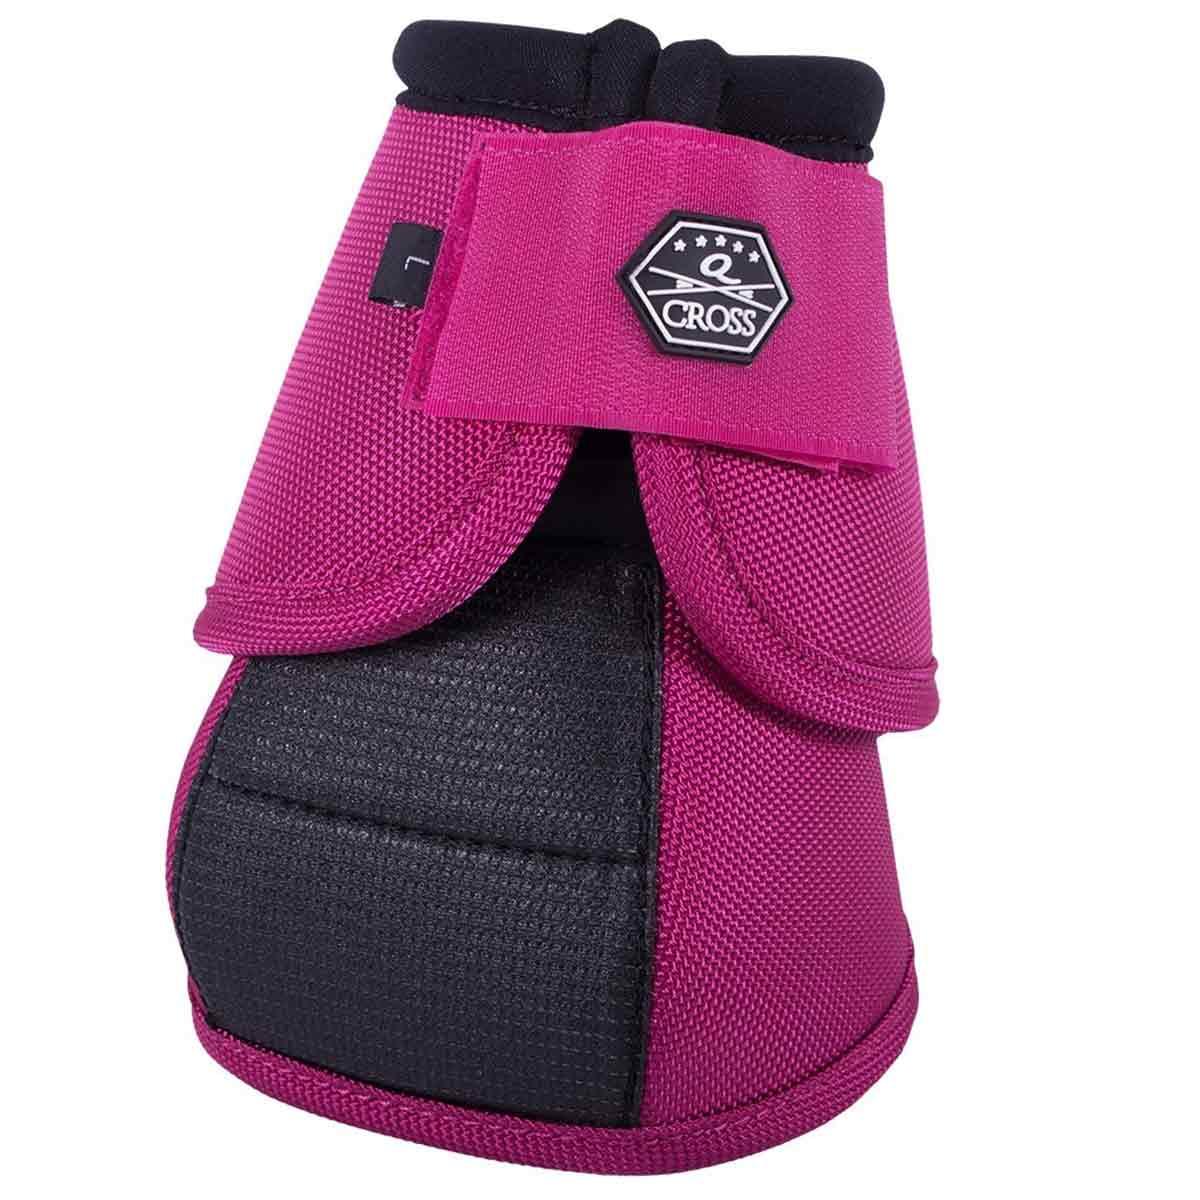 QHP QCross Kevlar springschoenen paars maat:l